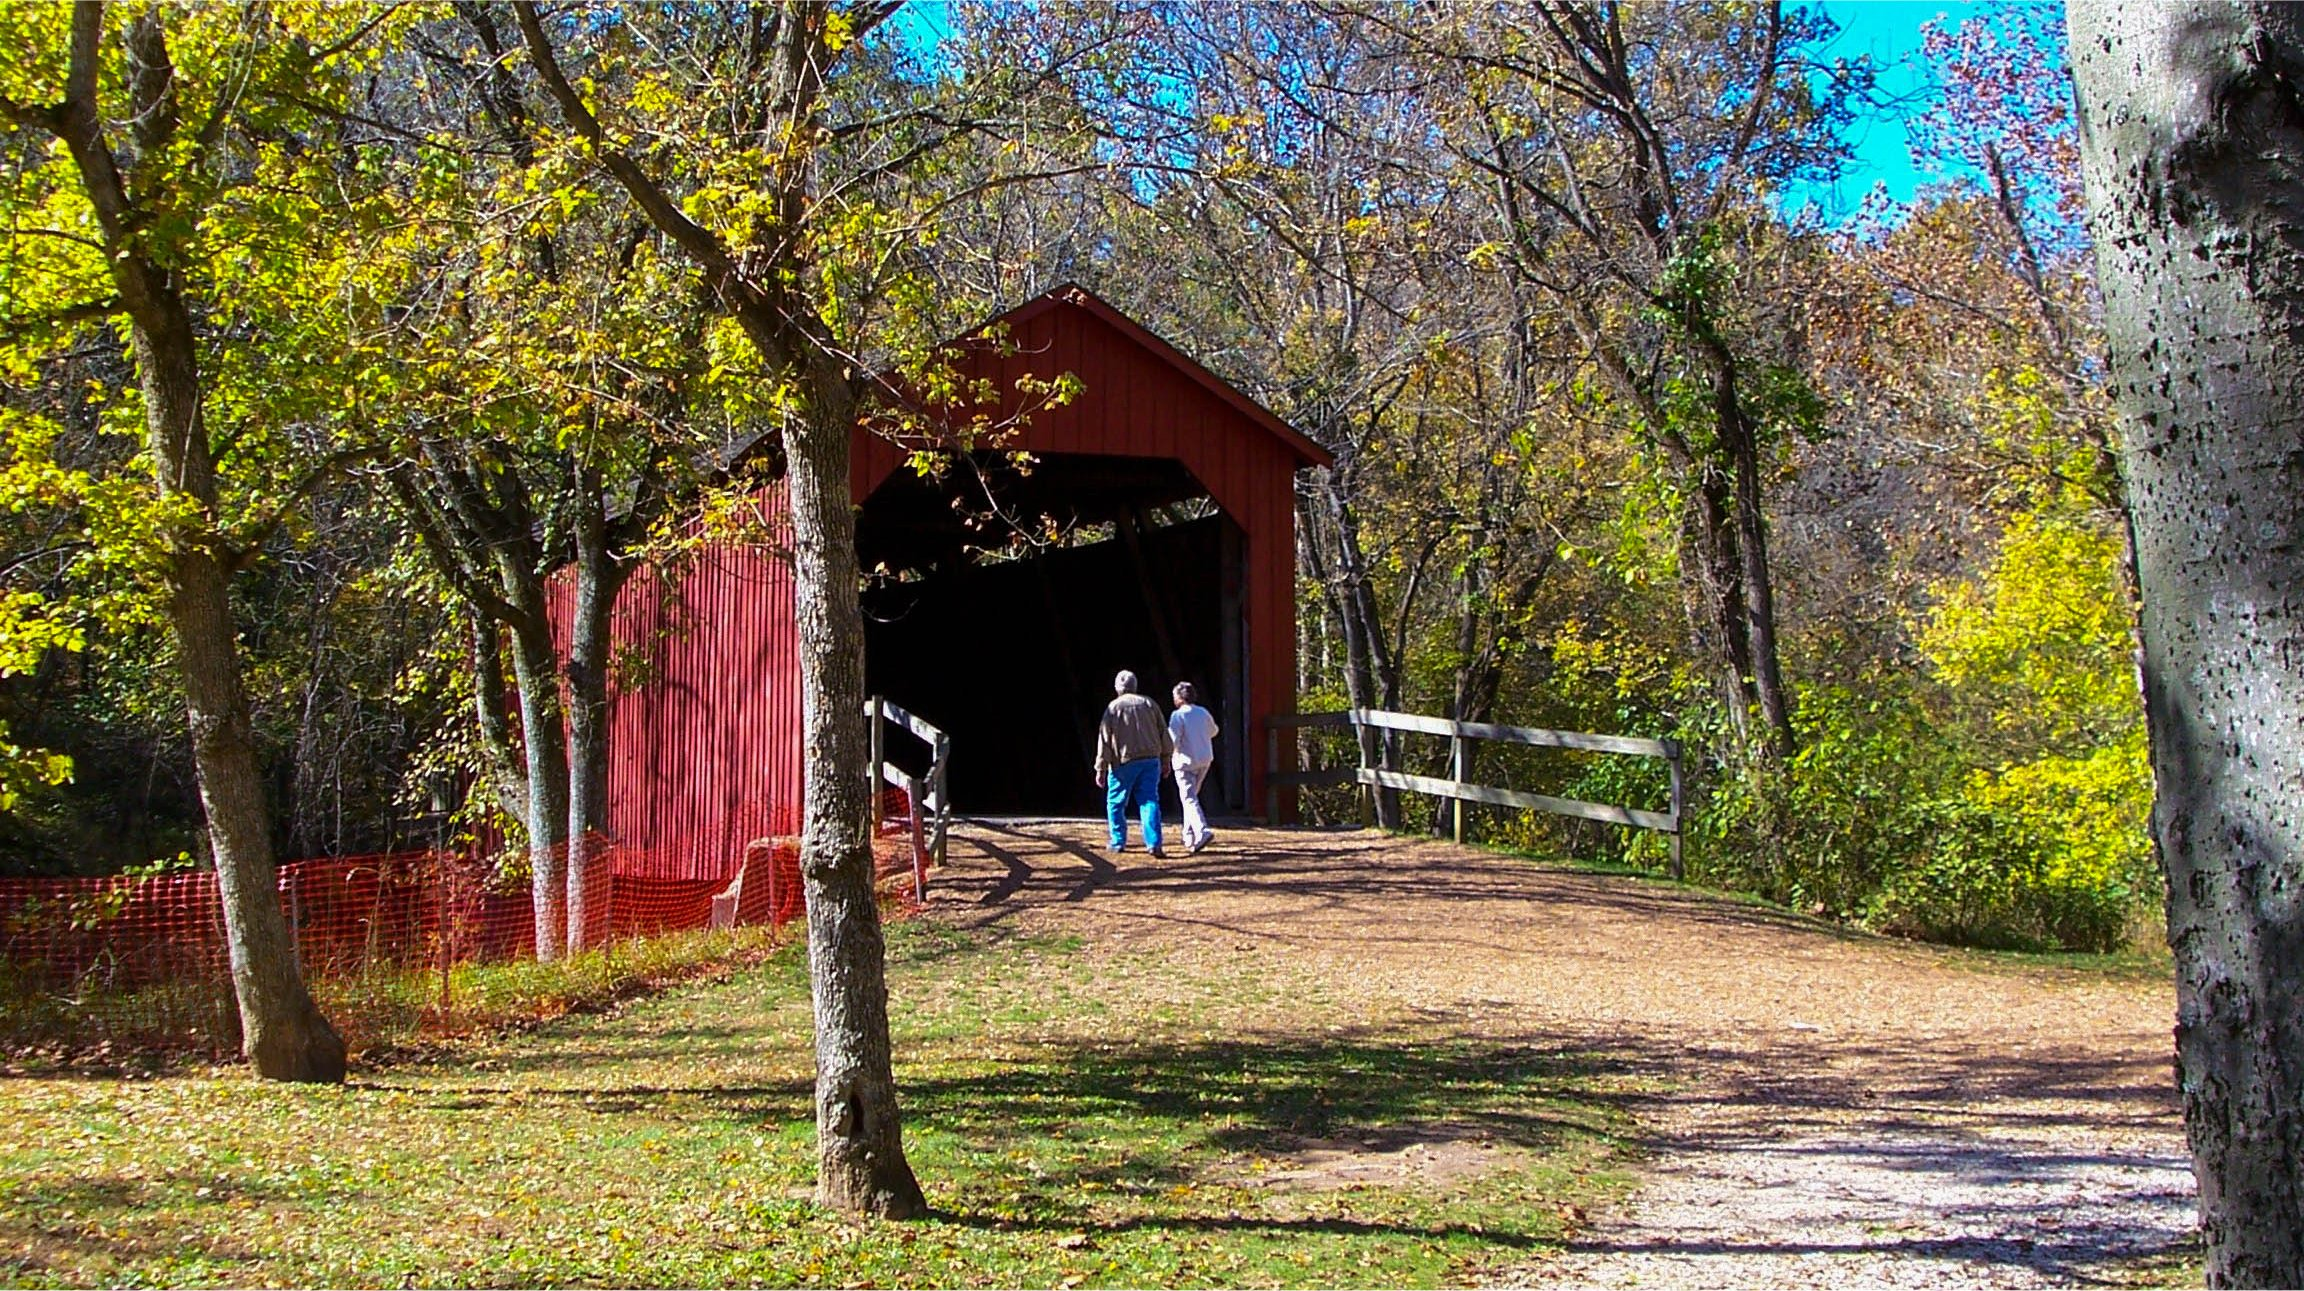 Sandy Creek Covered Bridge State Historic Site Goldman, Missouri